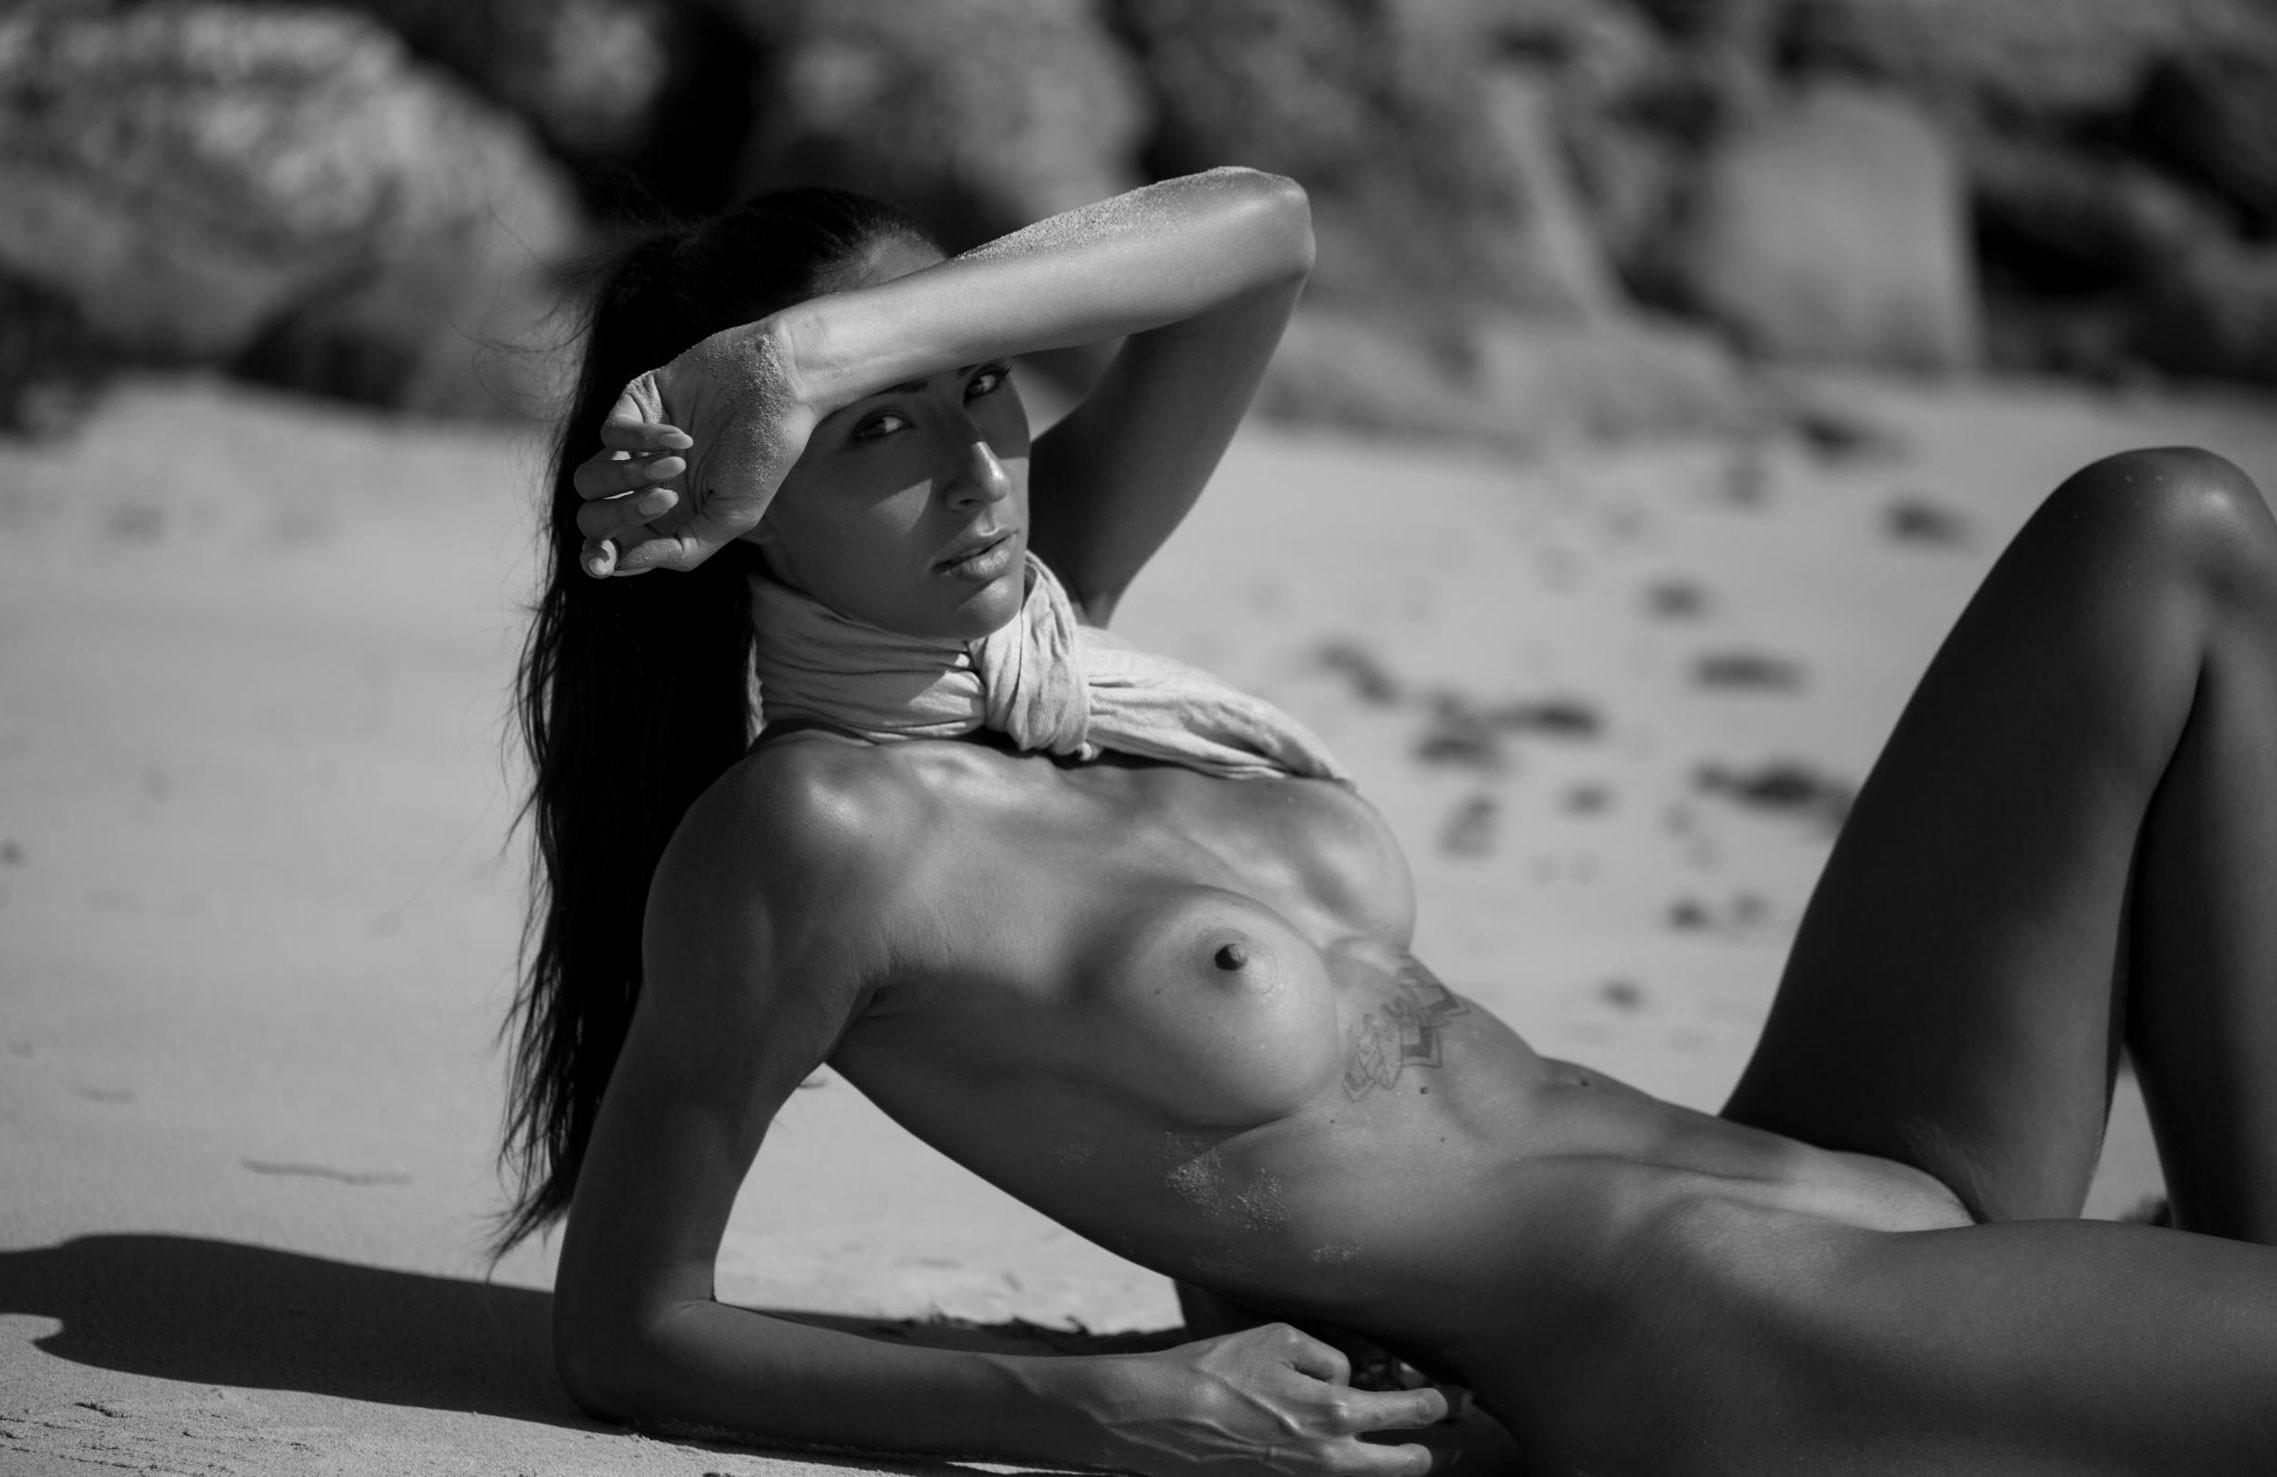 Isidora-Madzarevic-Ocean-Unicorn-by-James-Felix-10.jpg